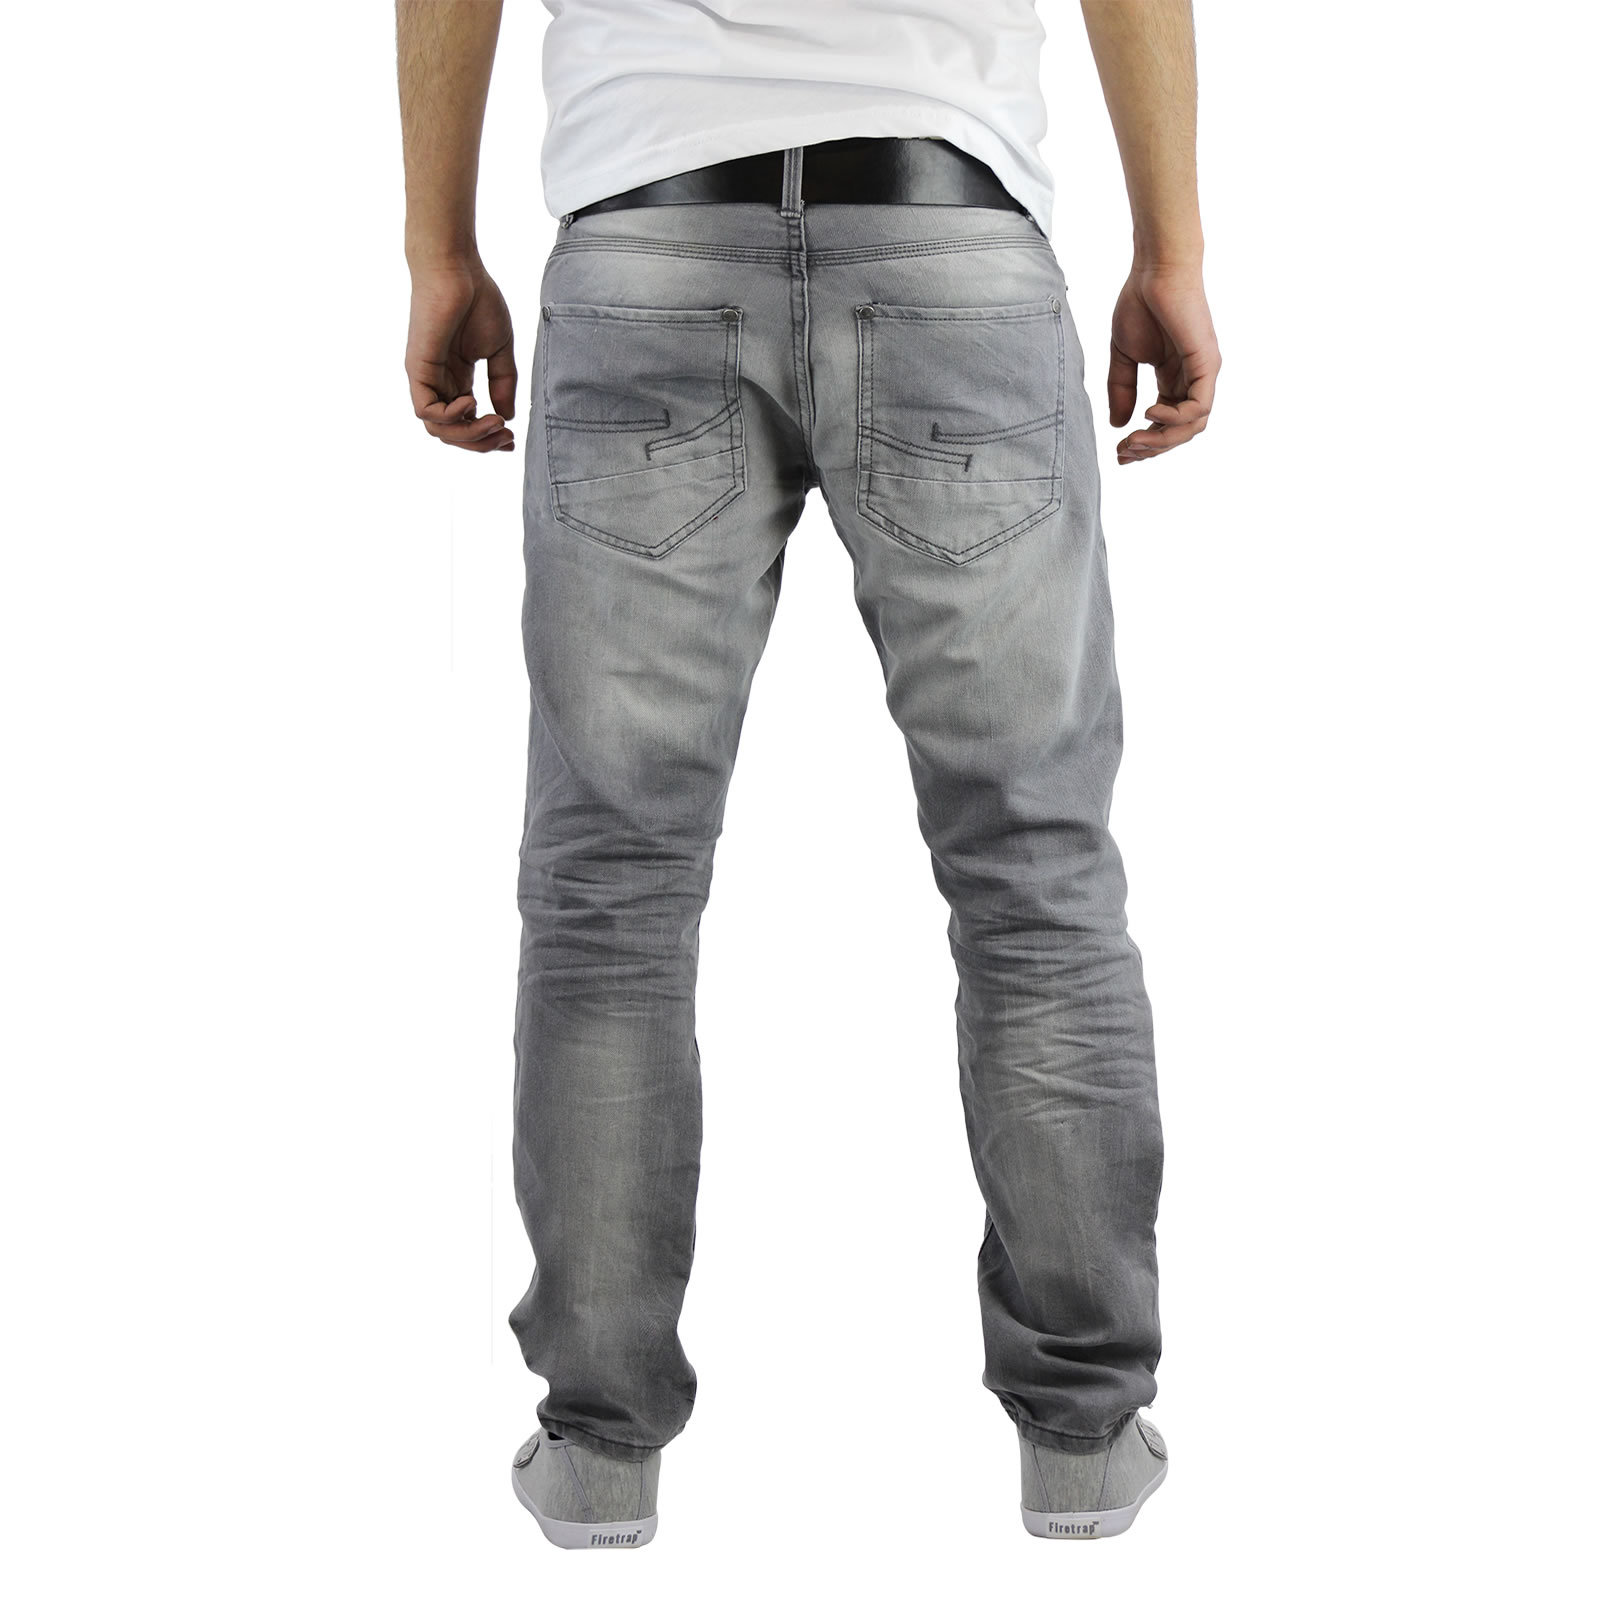 Hommes Wayne Lavage Ch Bleu Adapter Un Jean Slim Avec Ceinture Crosshatch ruRpkckq